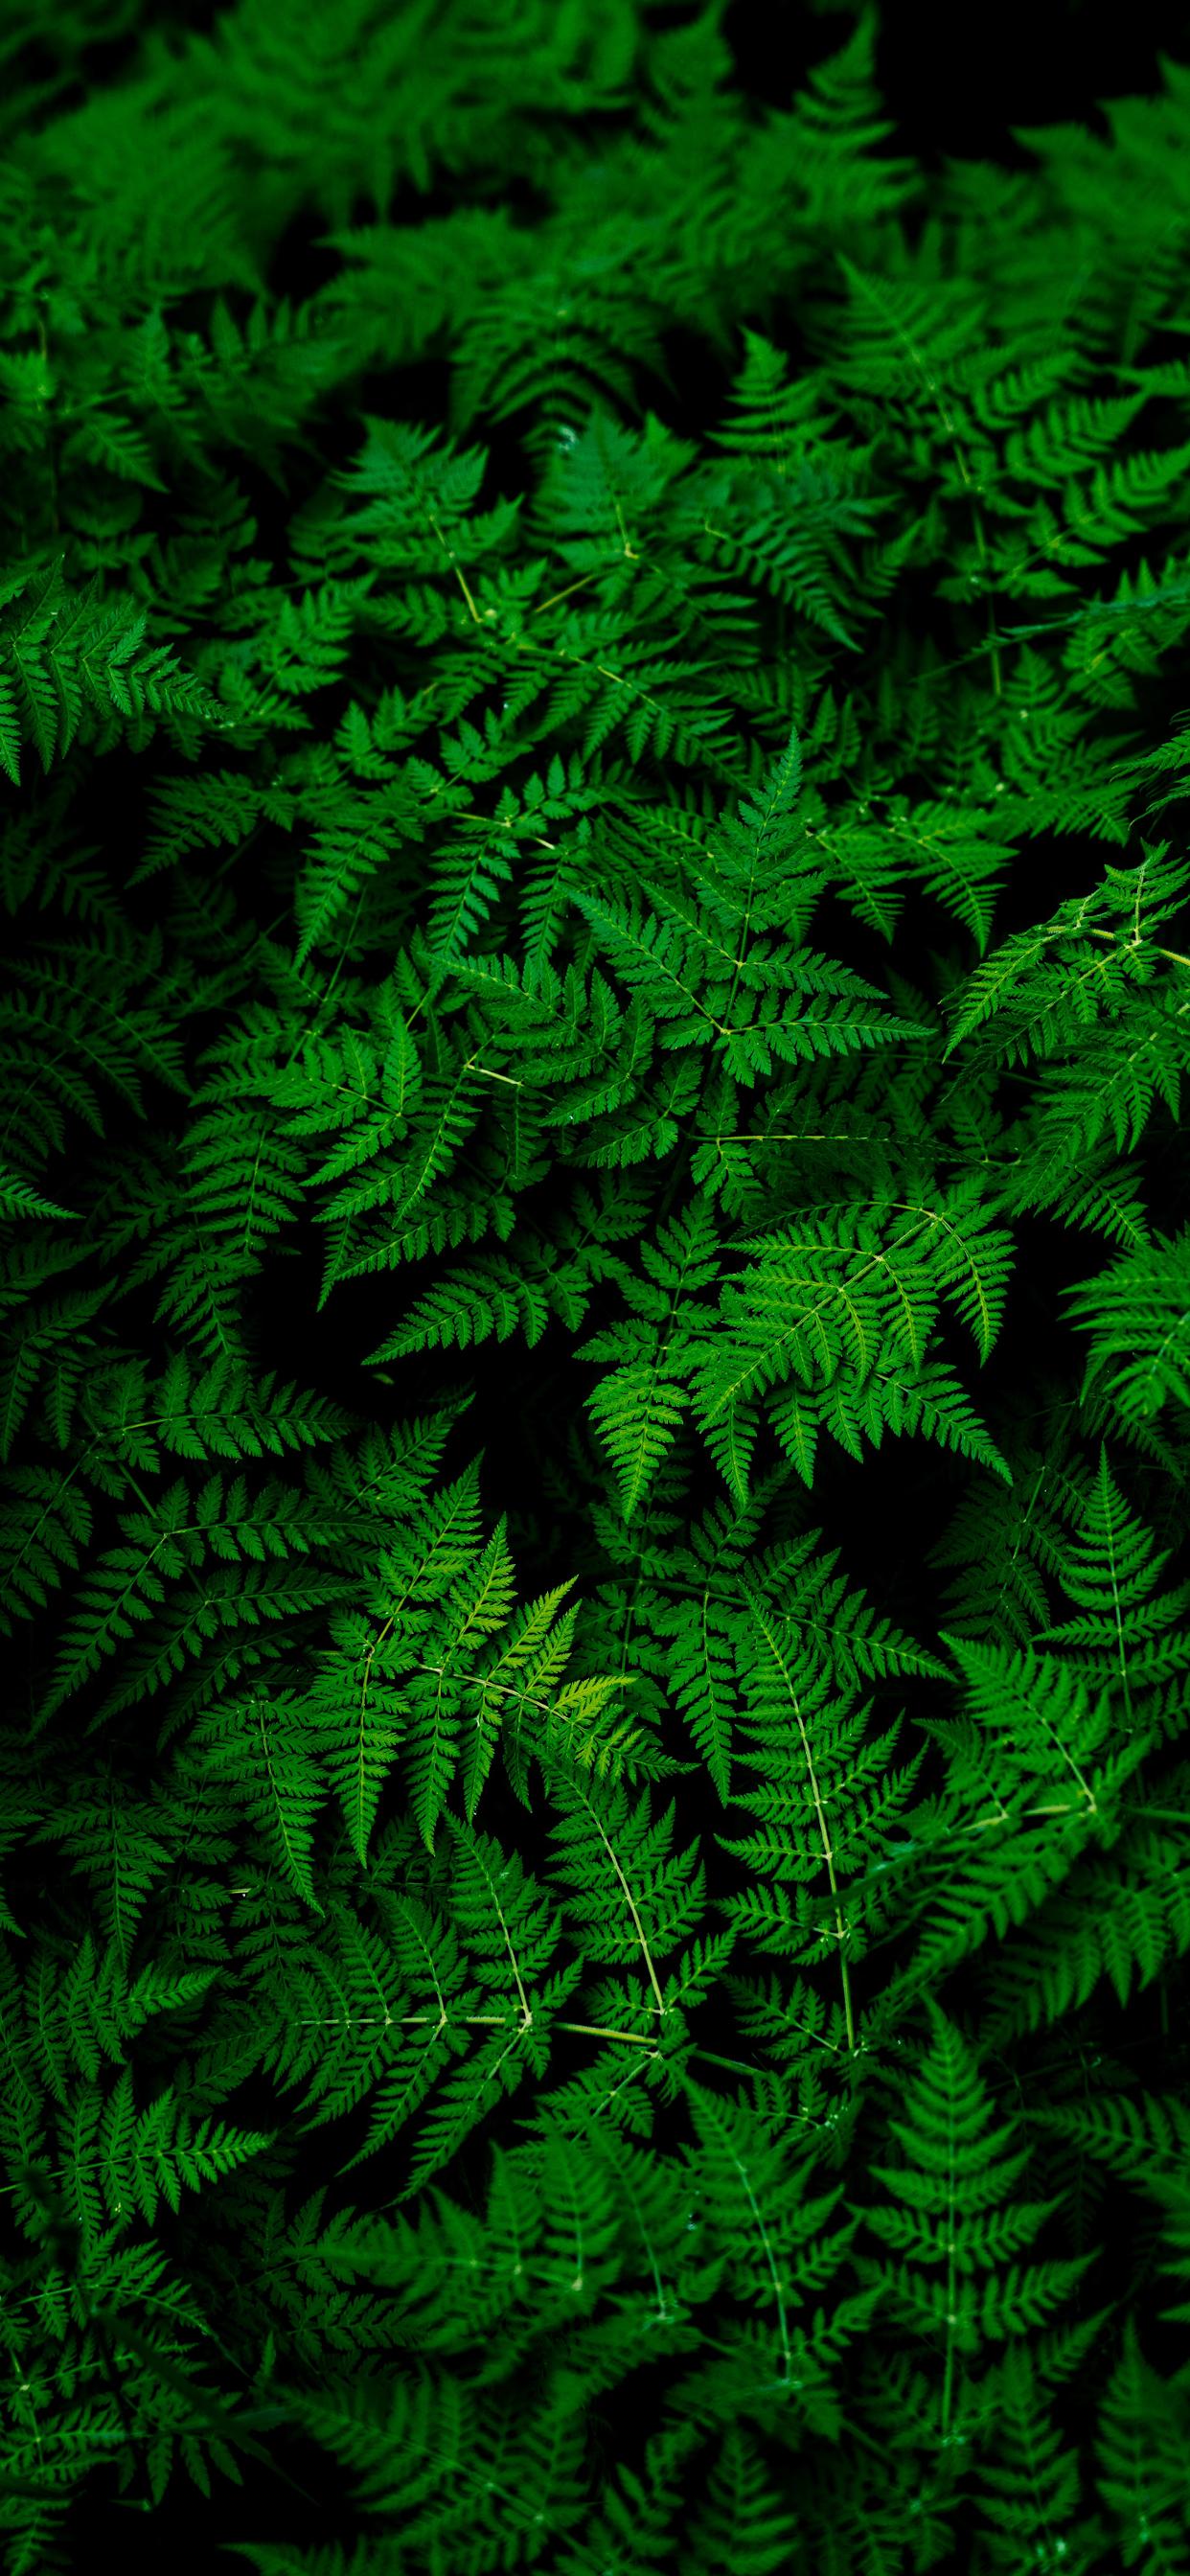 iPhone wallpapers plants stockholm sweden Plants